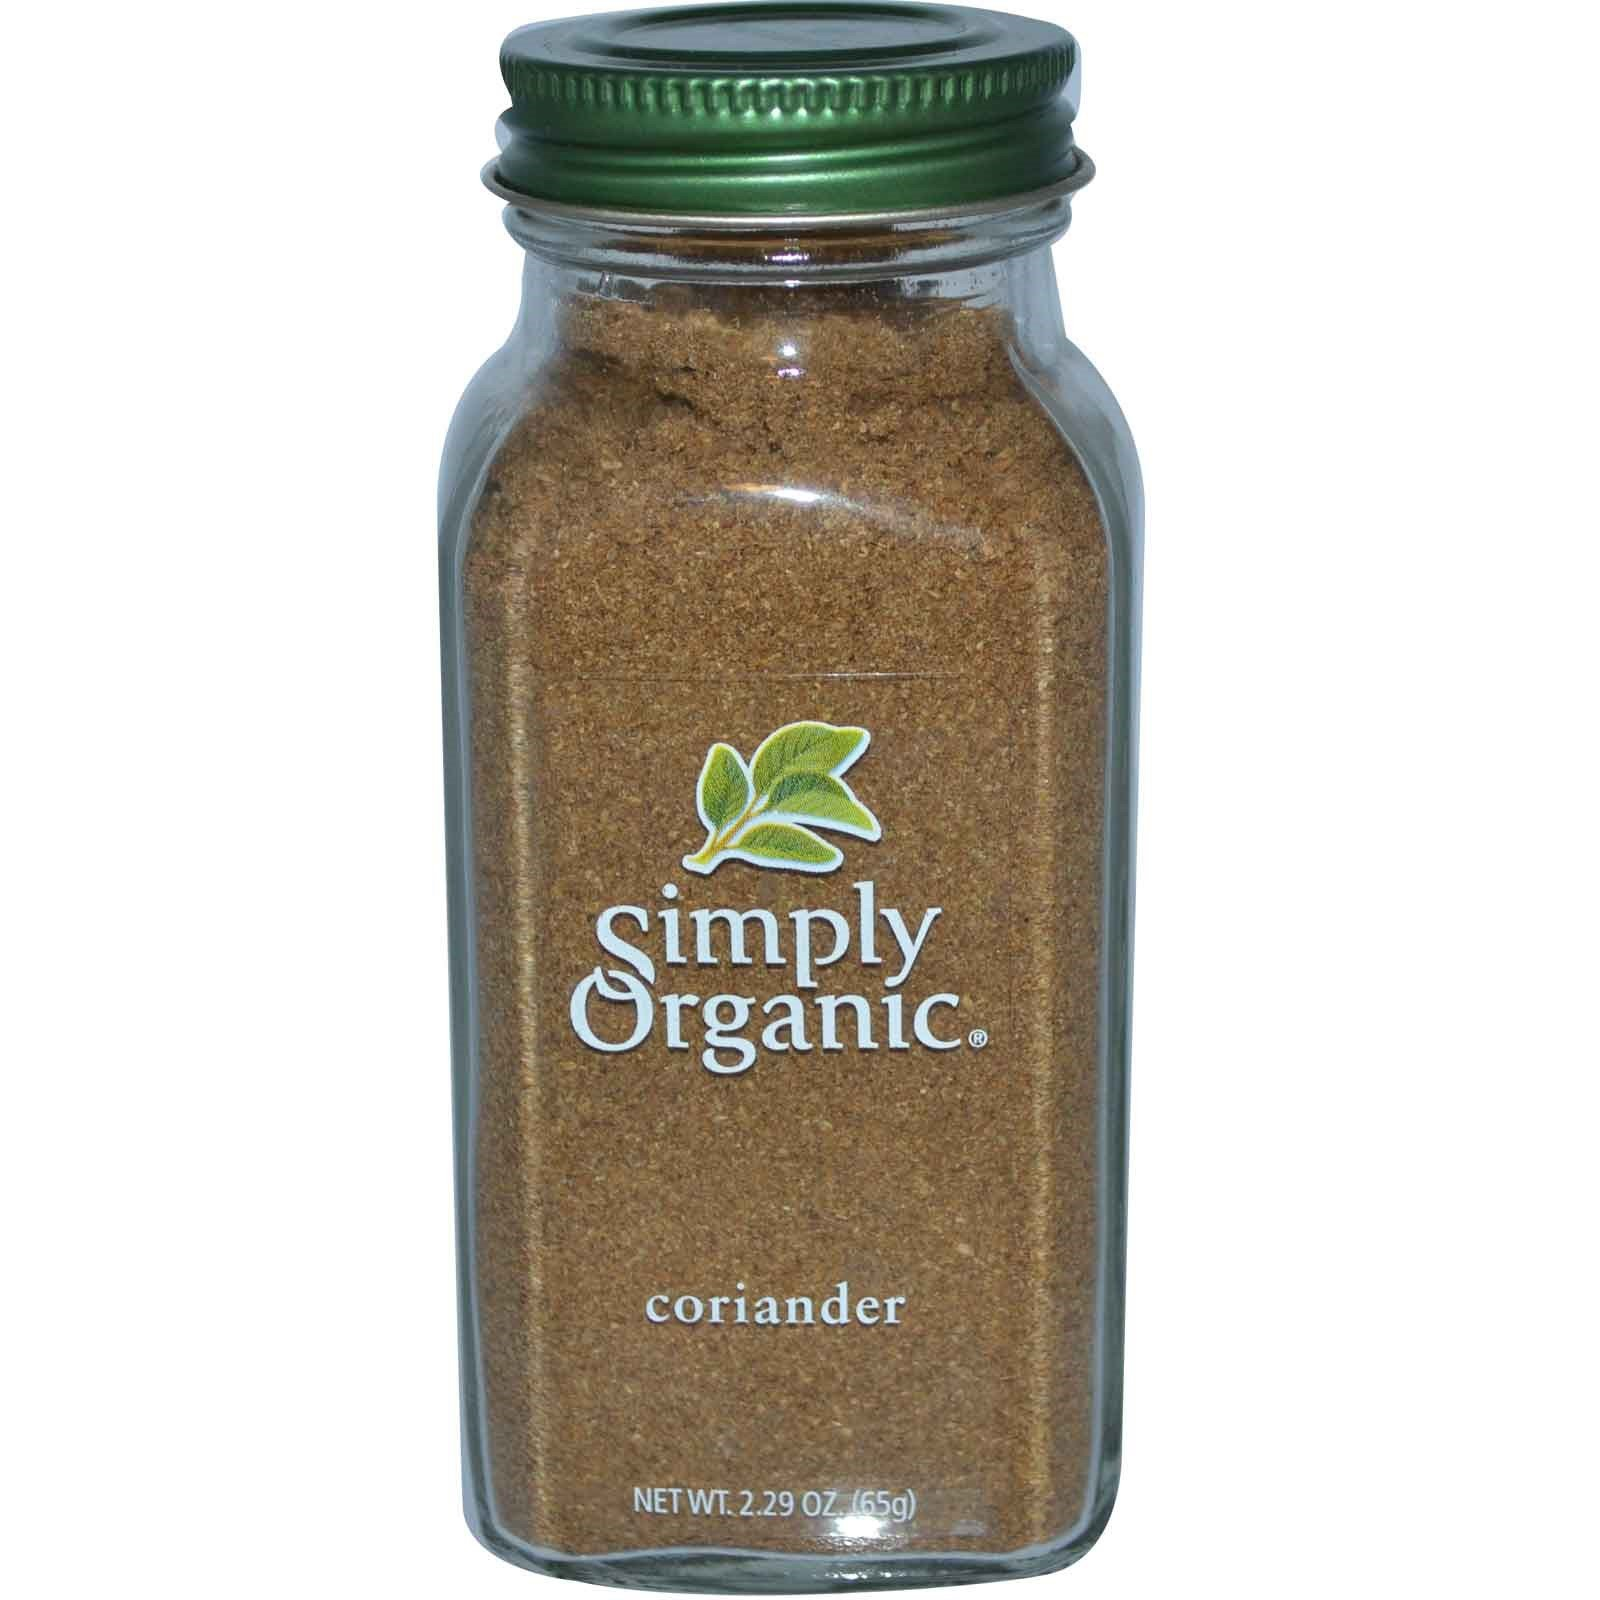 Simply Organic, Coriander, 2.29 oz (65 g) - 2 Bottles